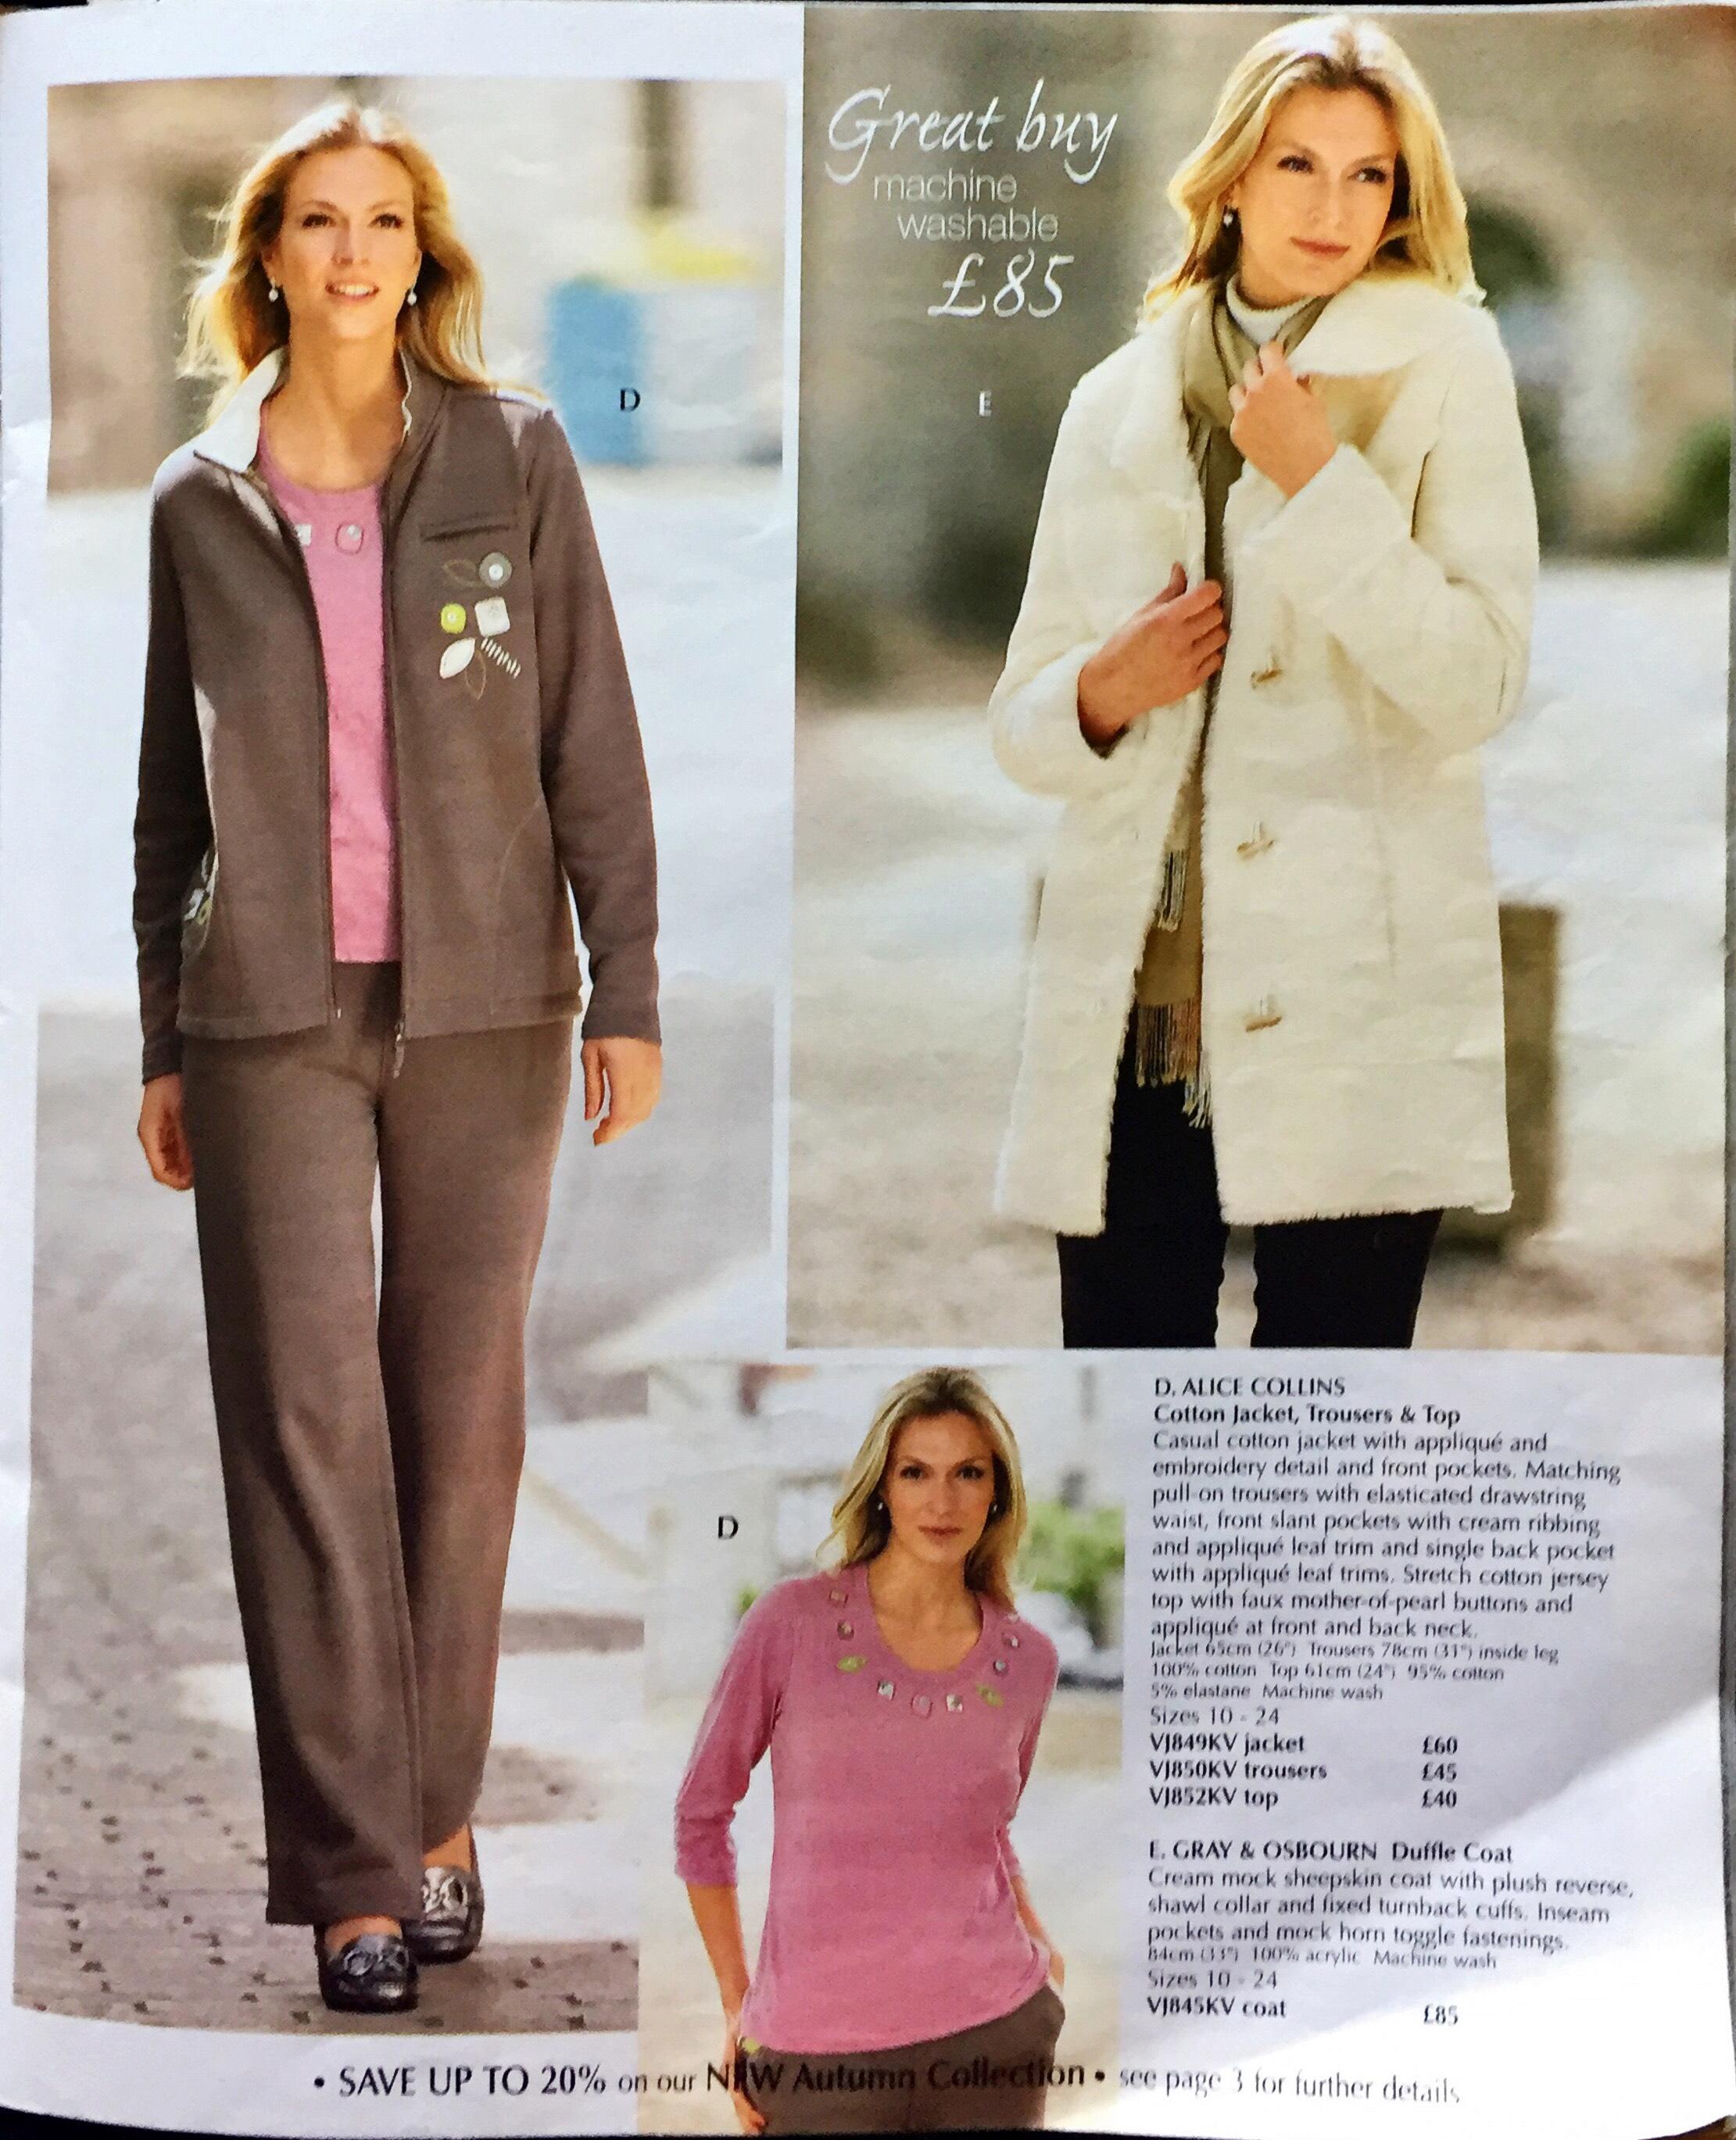 Gray and osbourne fashion 67